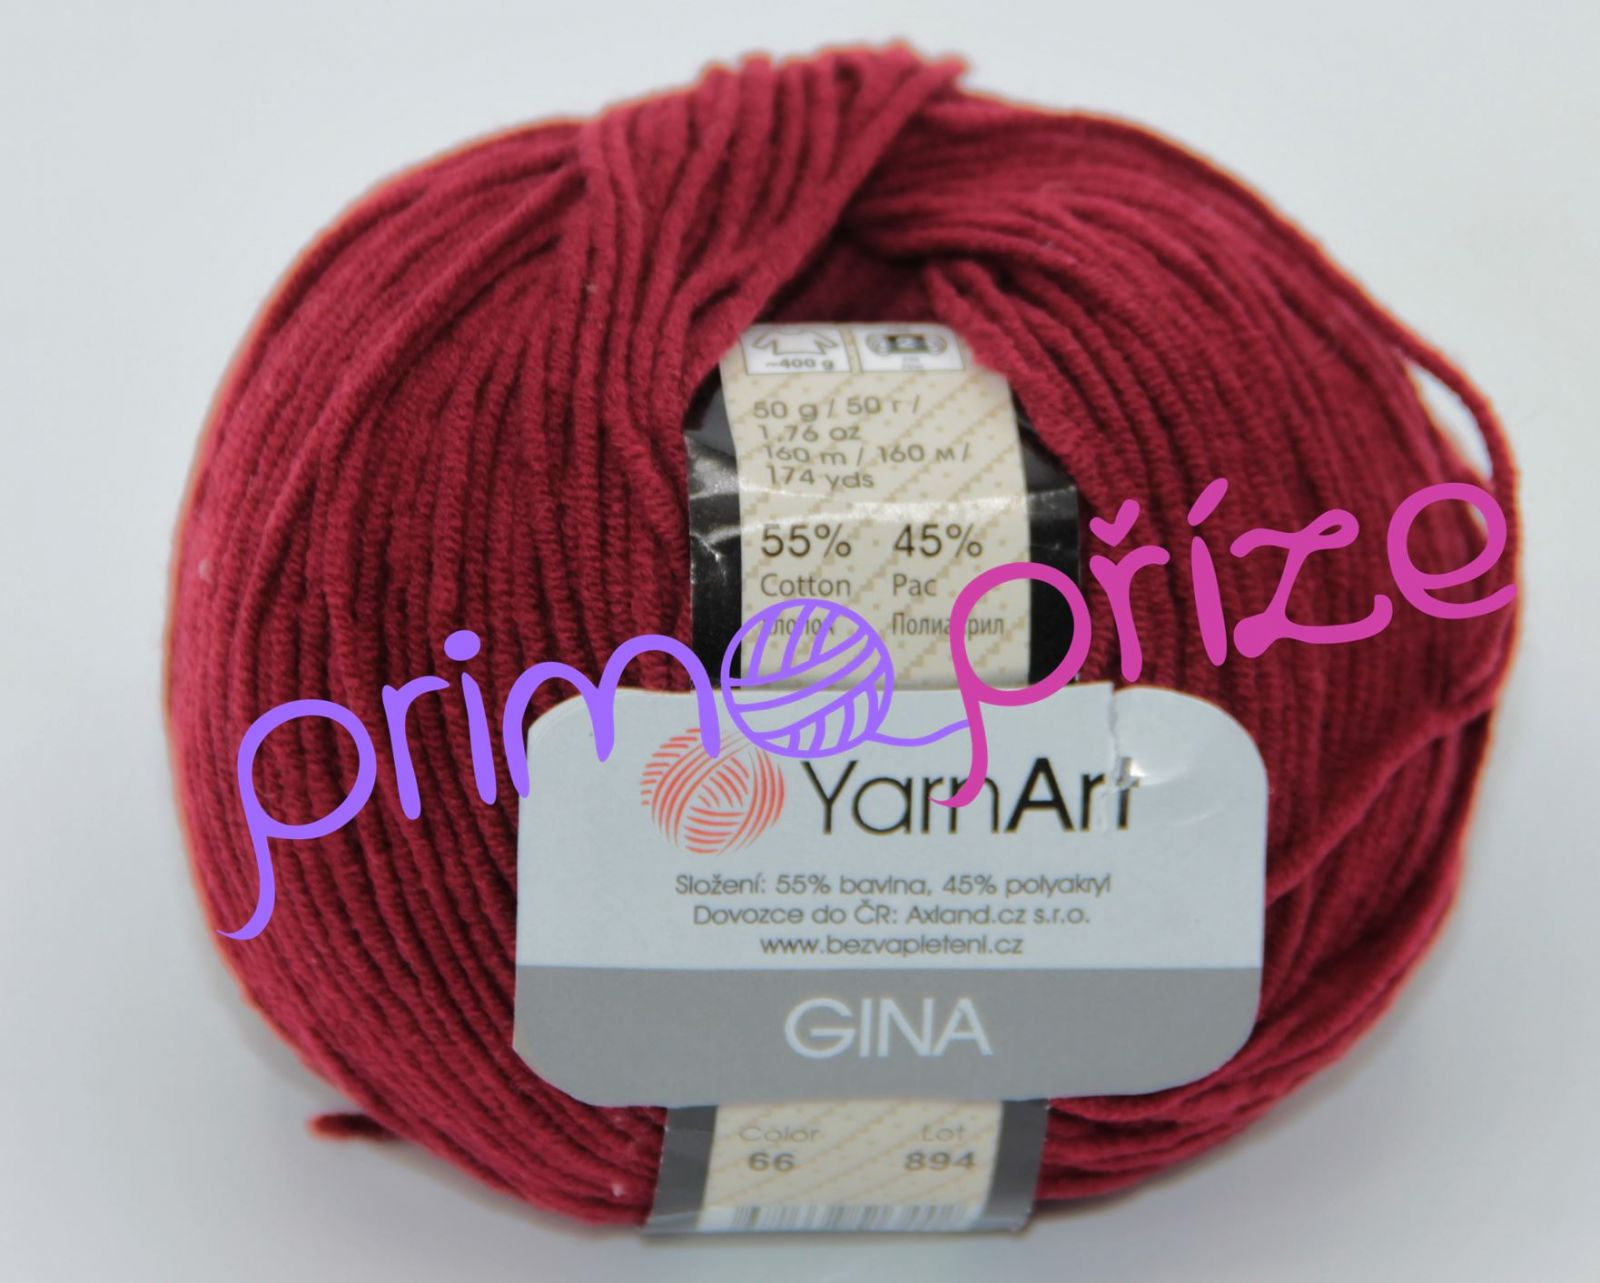 YarnArt Jeans/Gina 66 bordo